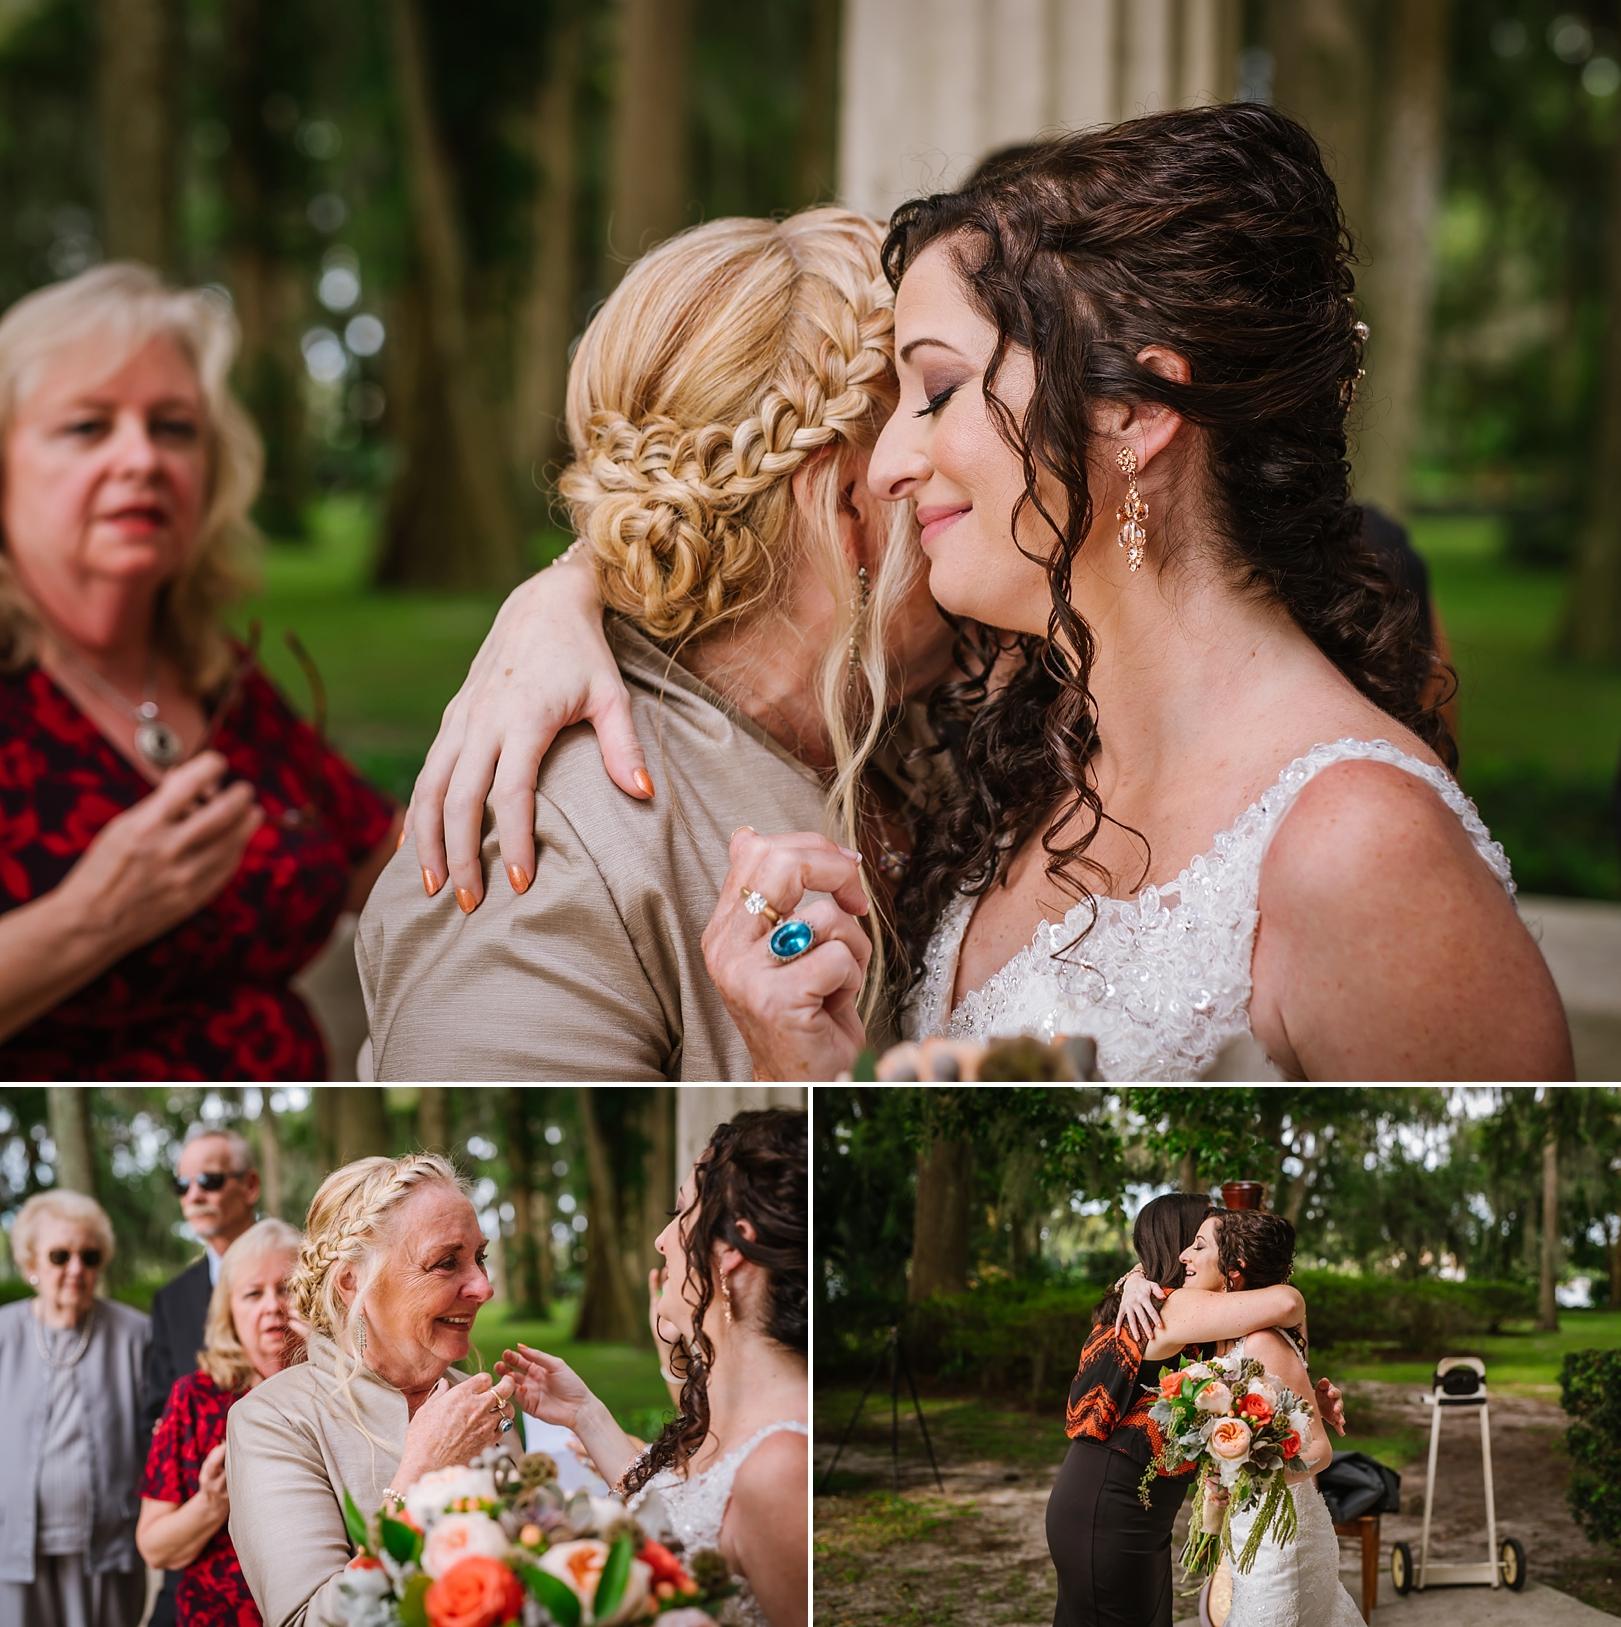 kraft-azalea-gardens-stylish-elopment-wedding-photography_0015.jpg